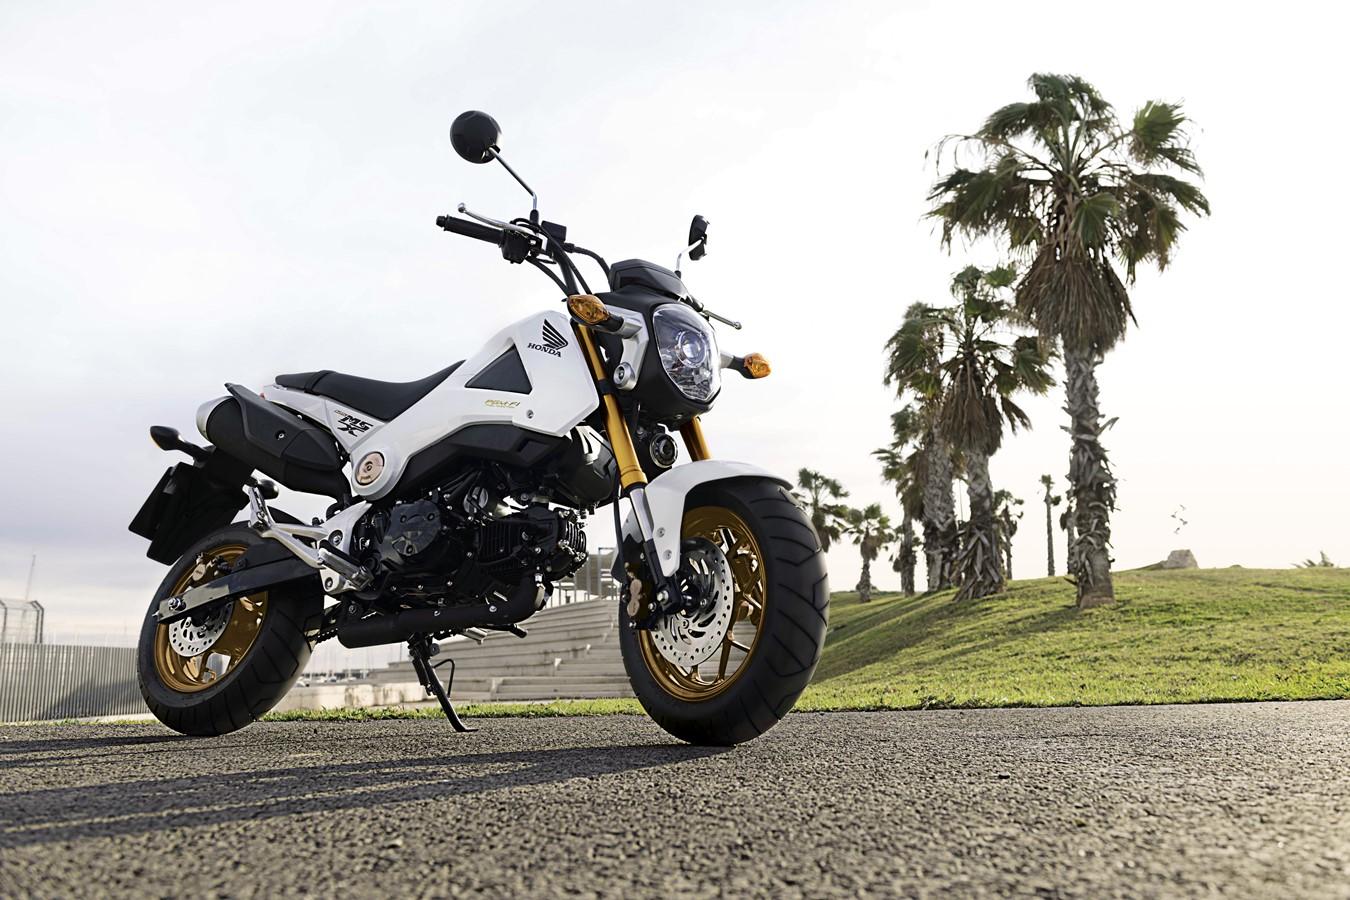 2014 HONDA MSX125